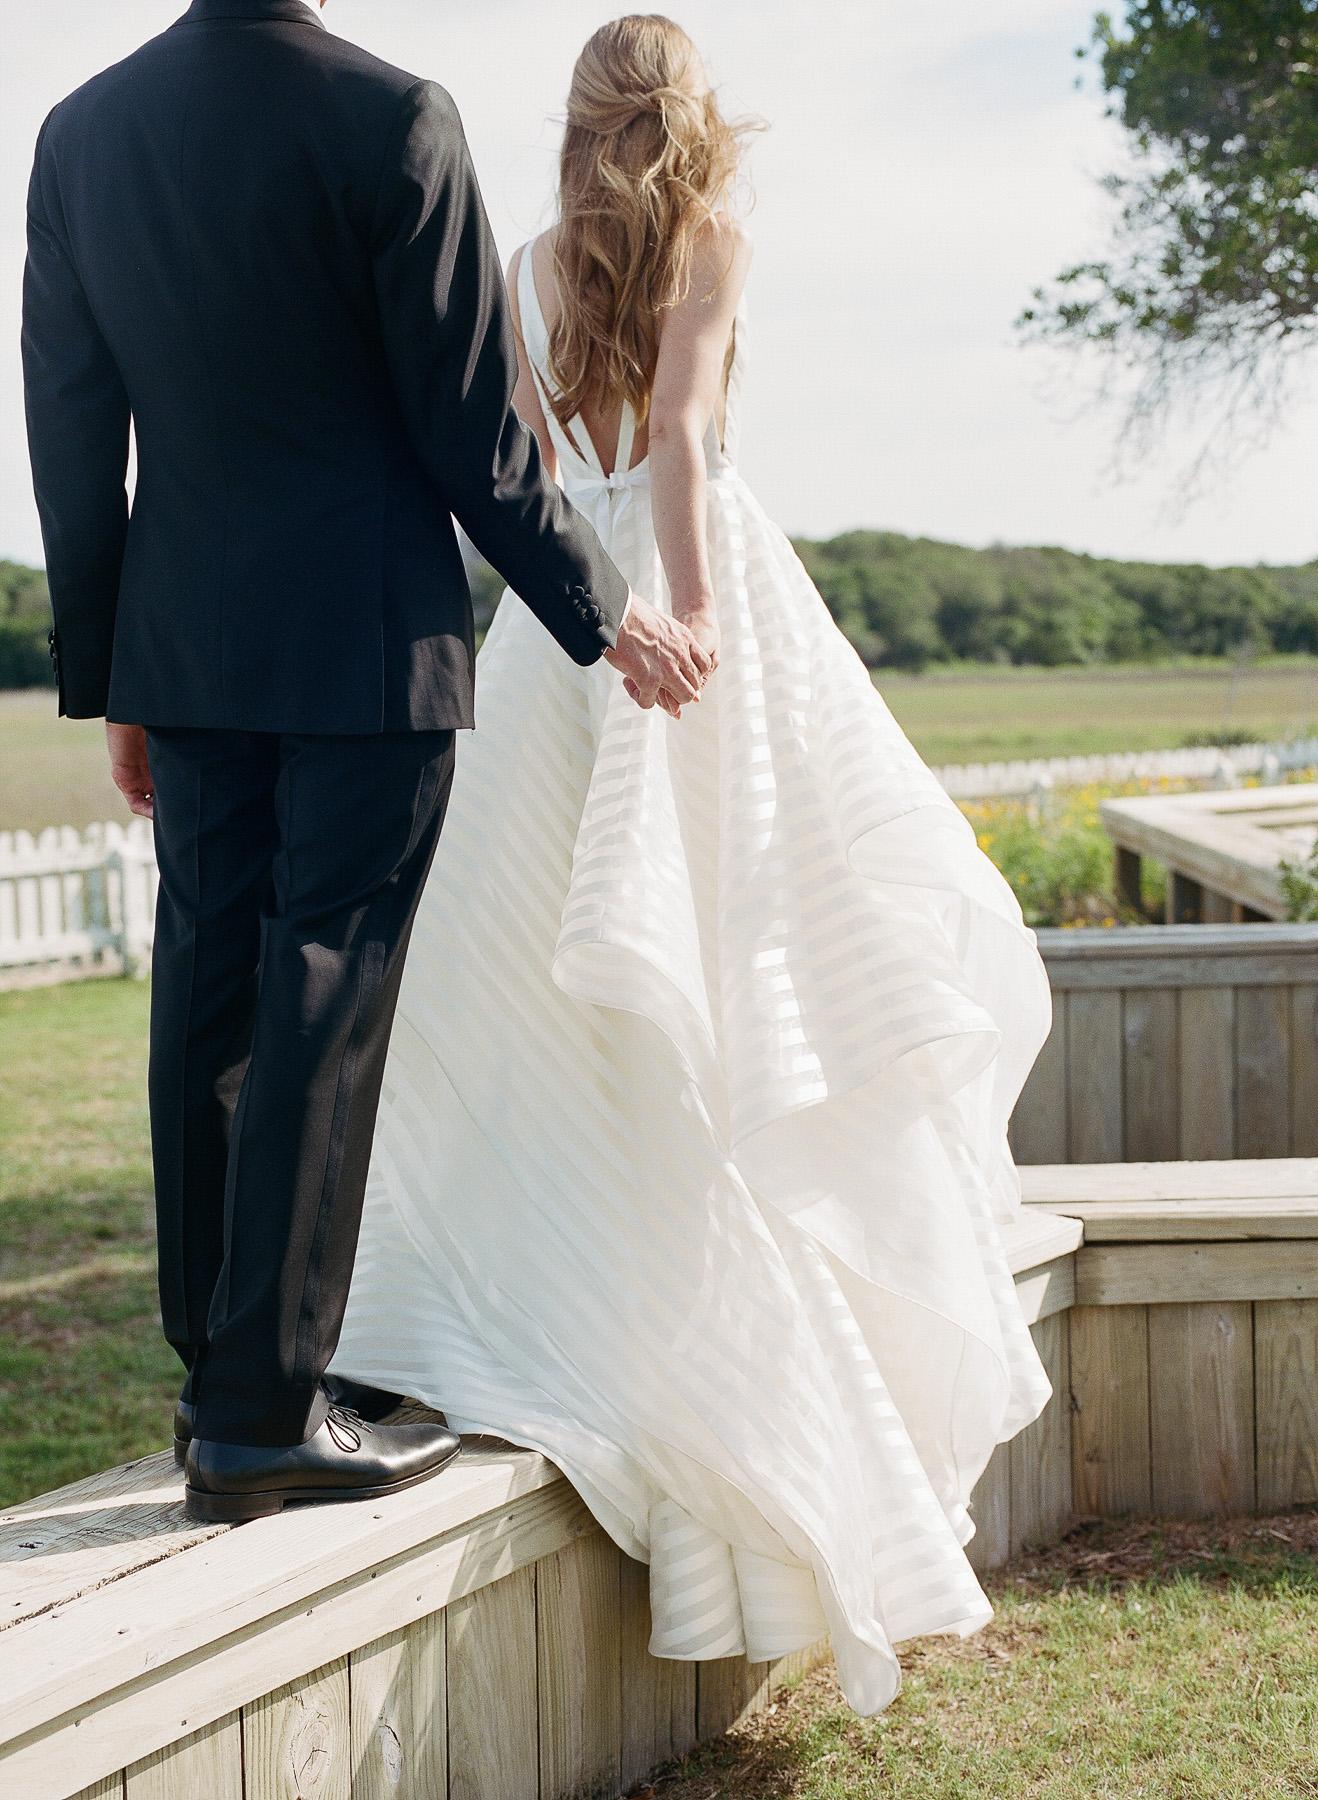 NC-wedding-photographer-best-13.jpg